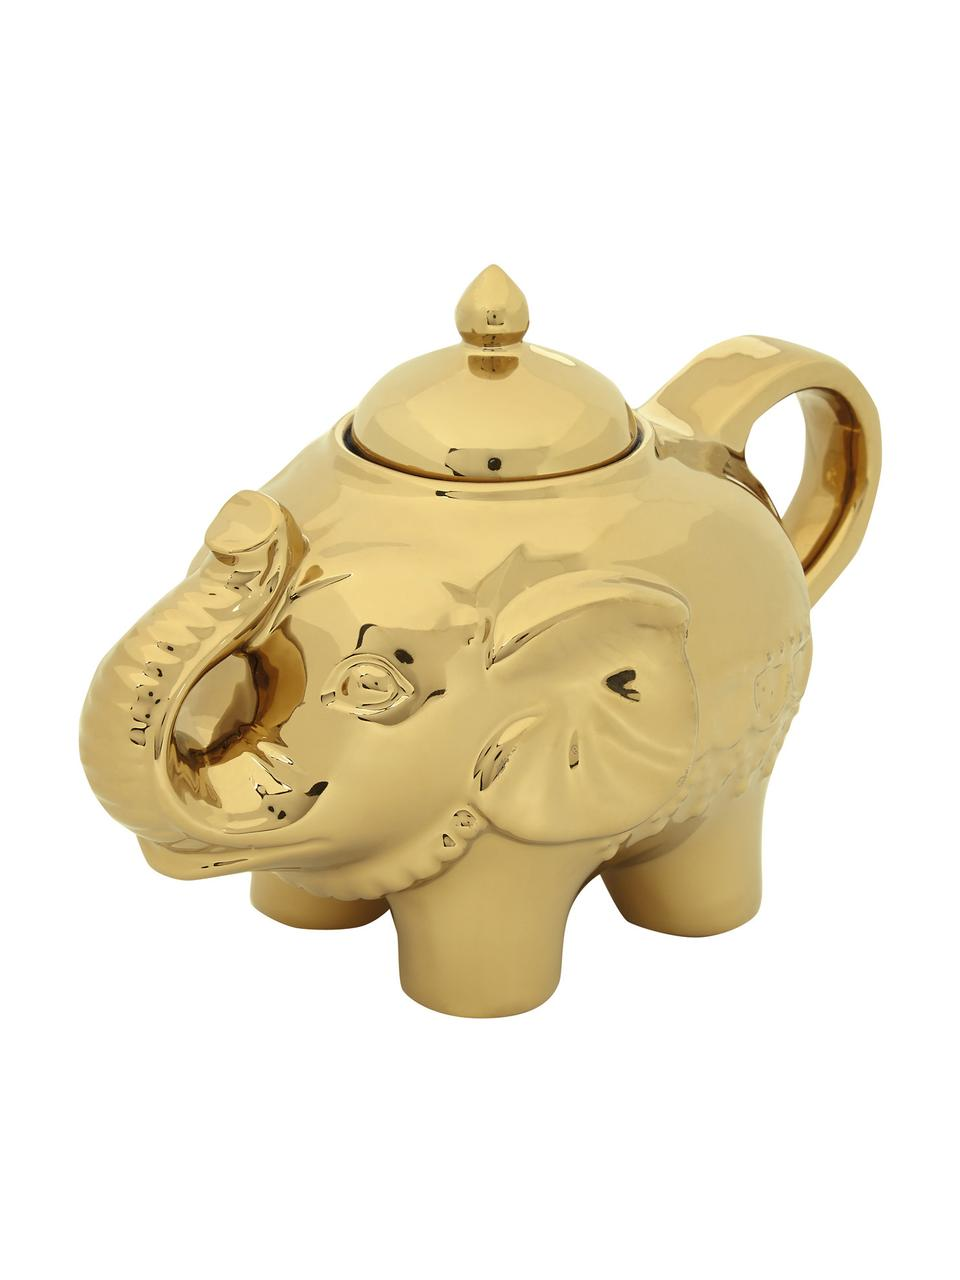 Zuckerdose Elephant, 300 ml, Glas, Goldfarben, 15 x 12 cm